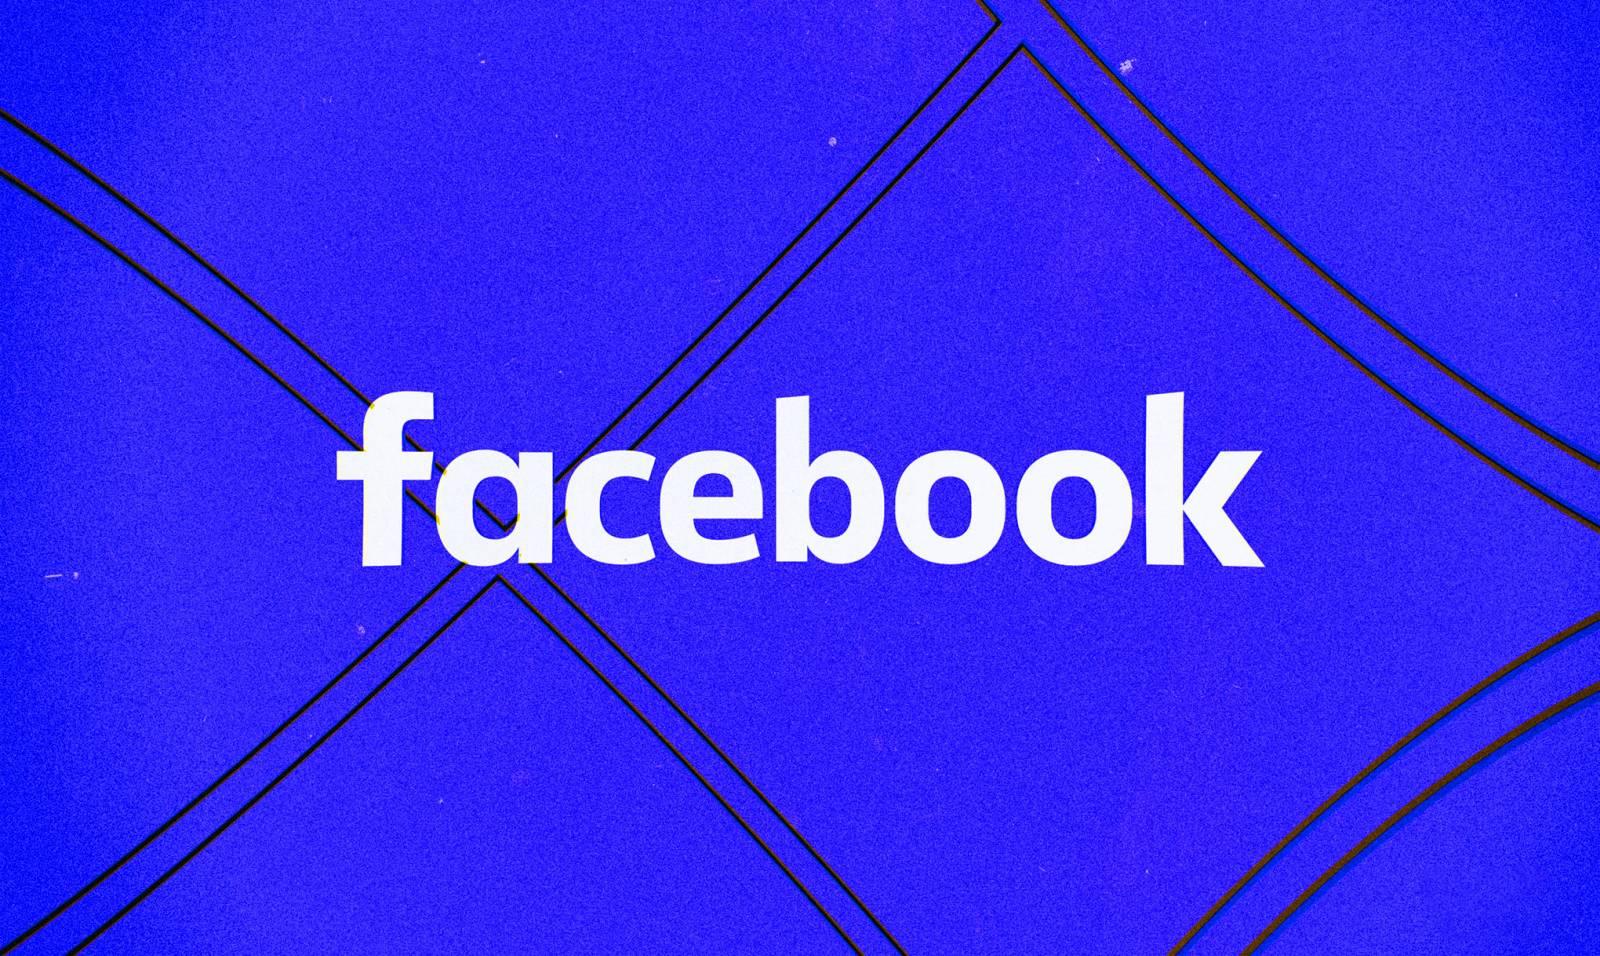 Facebook Update Nou Lansat Telefoane Tablete Aduce Nou